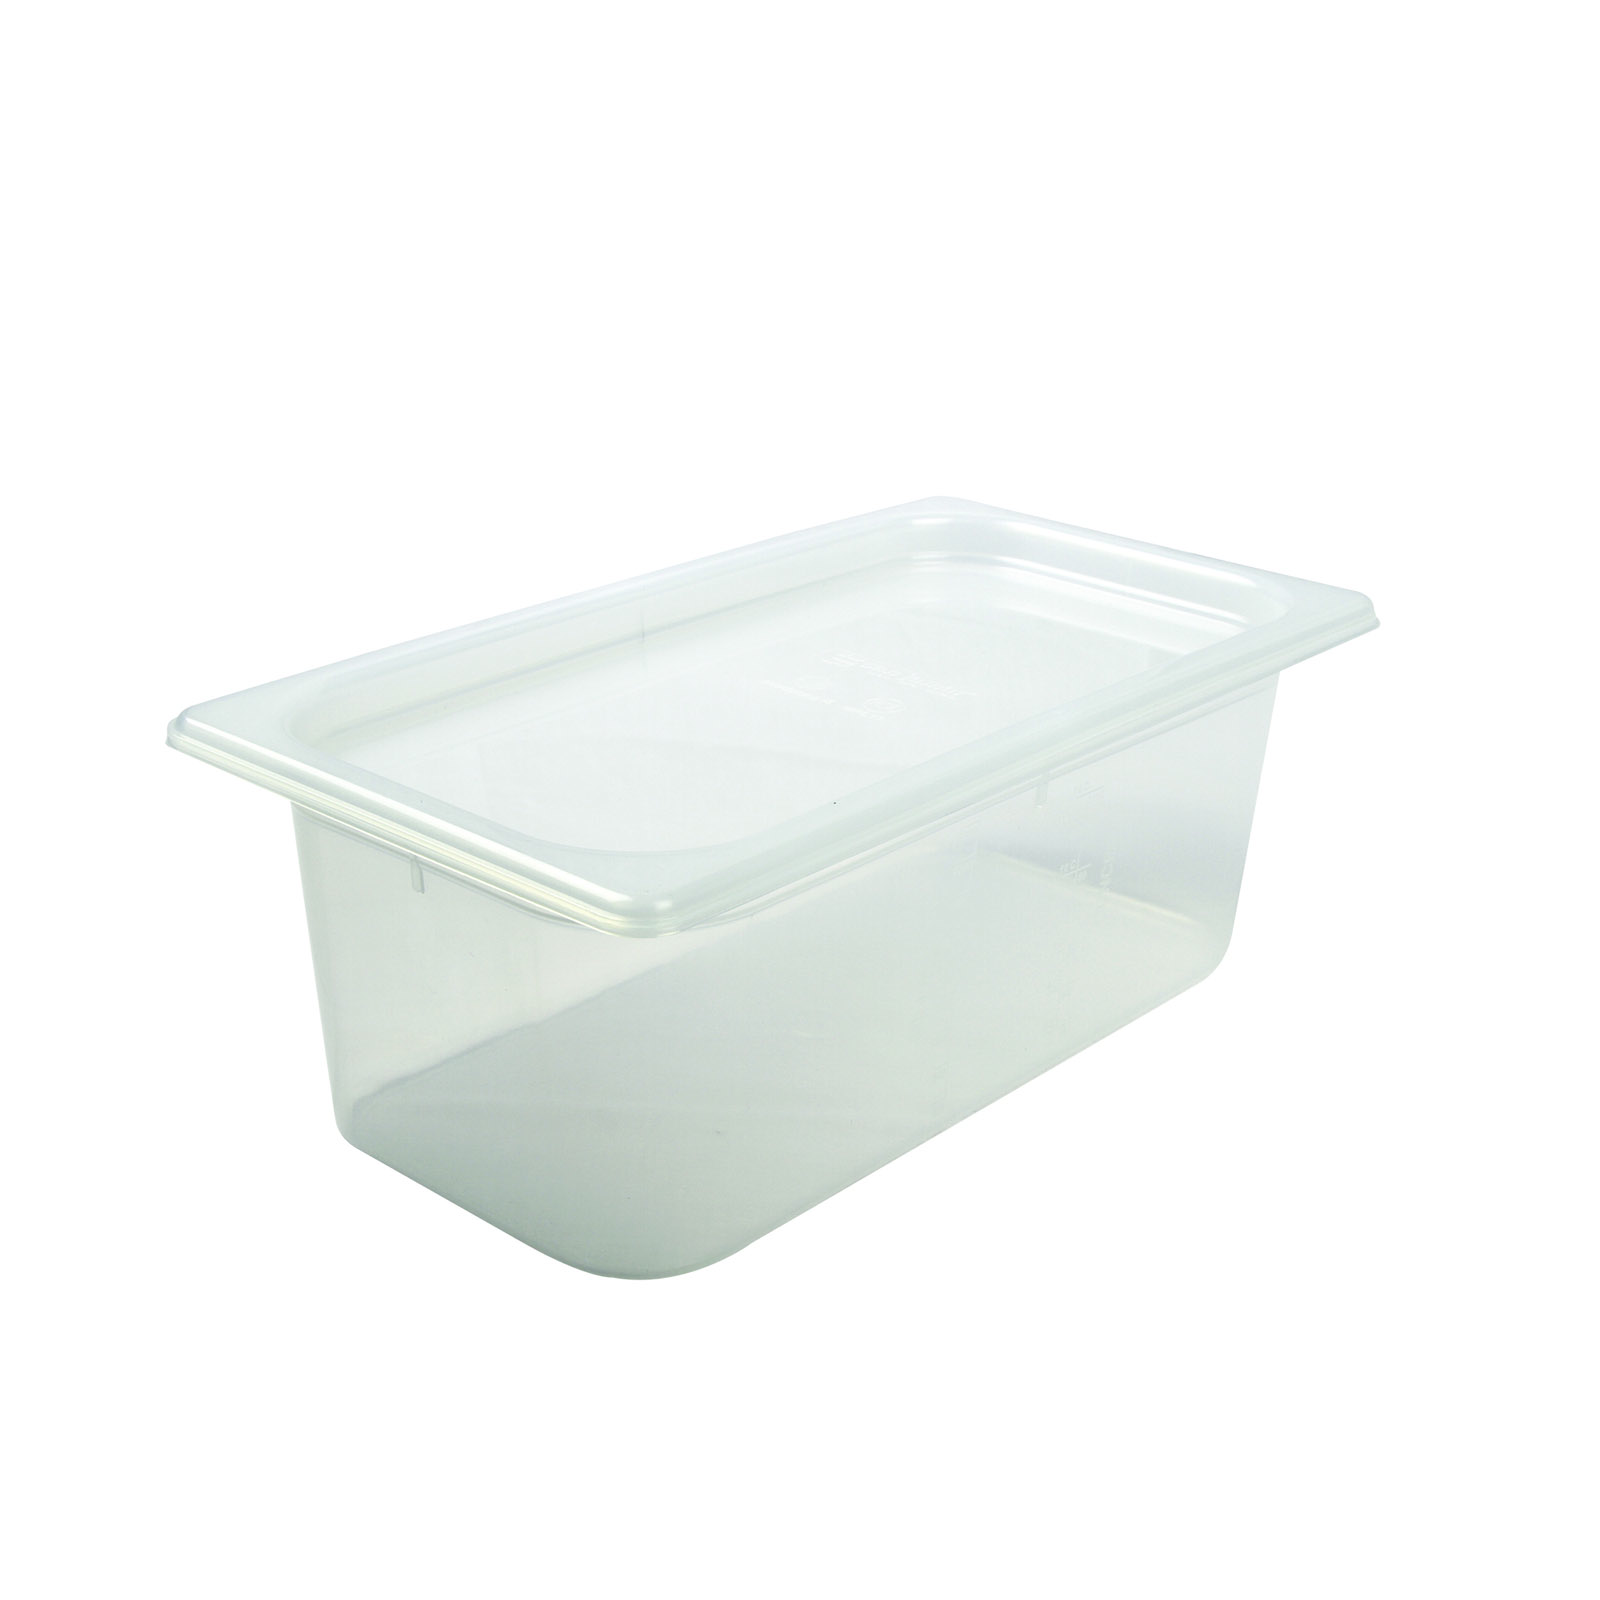 San Jamar MP13 food pan, plastic